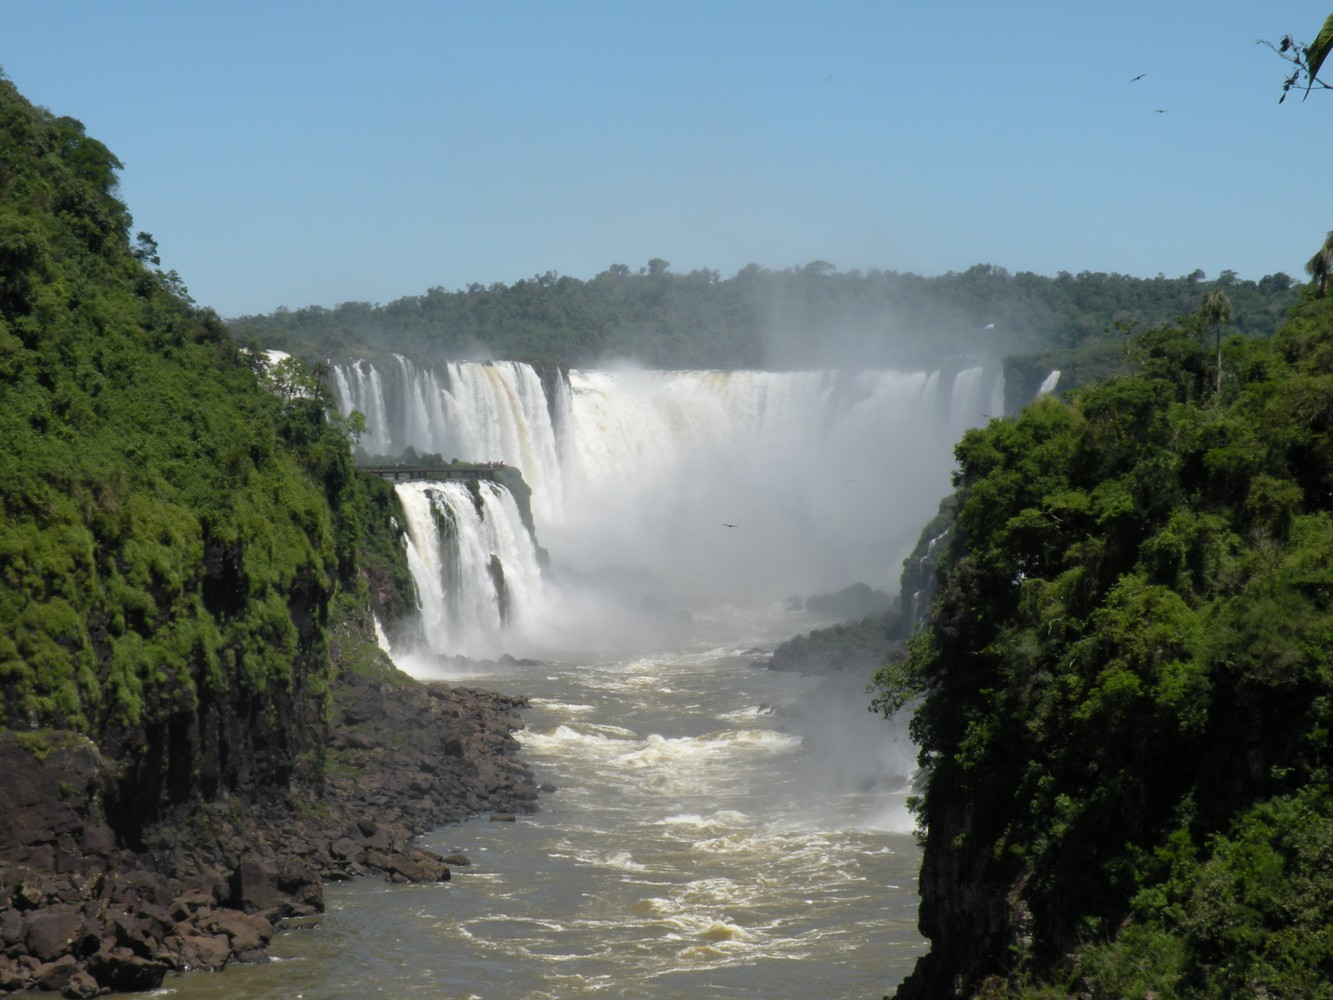 Circuito Inferior - Parque Nacional Iguazú